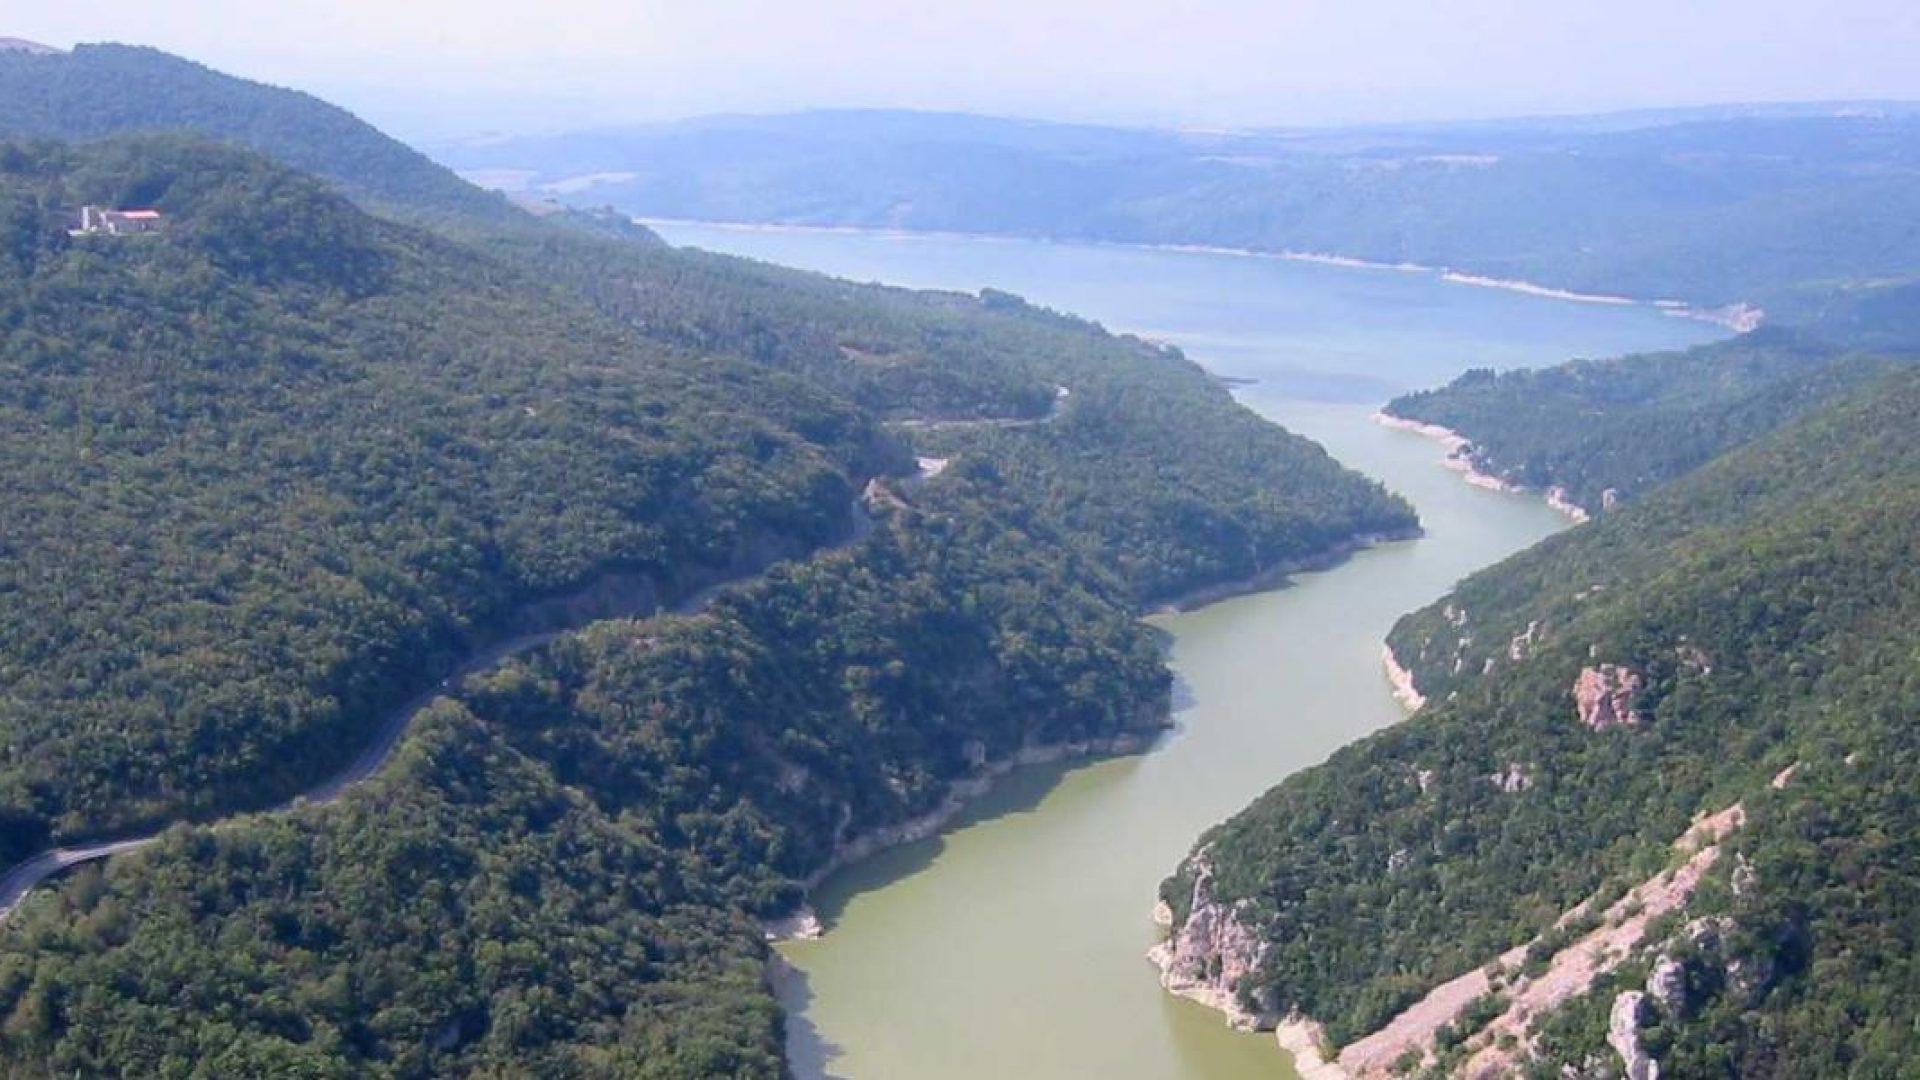 Parco fluviale del Tevere - Villamena Resort Assisi